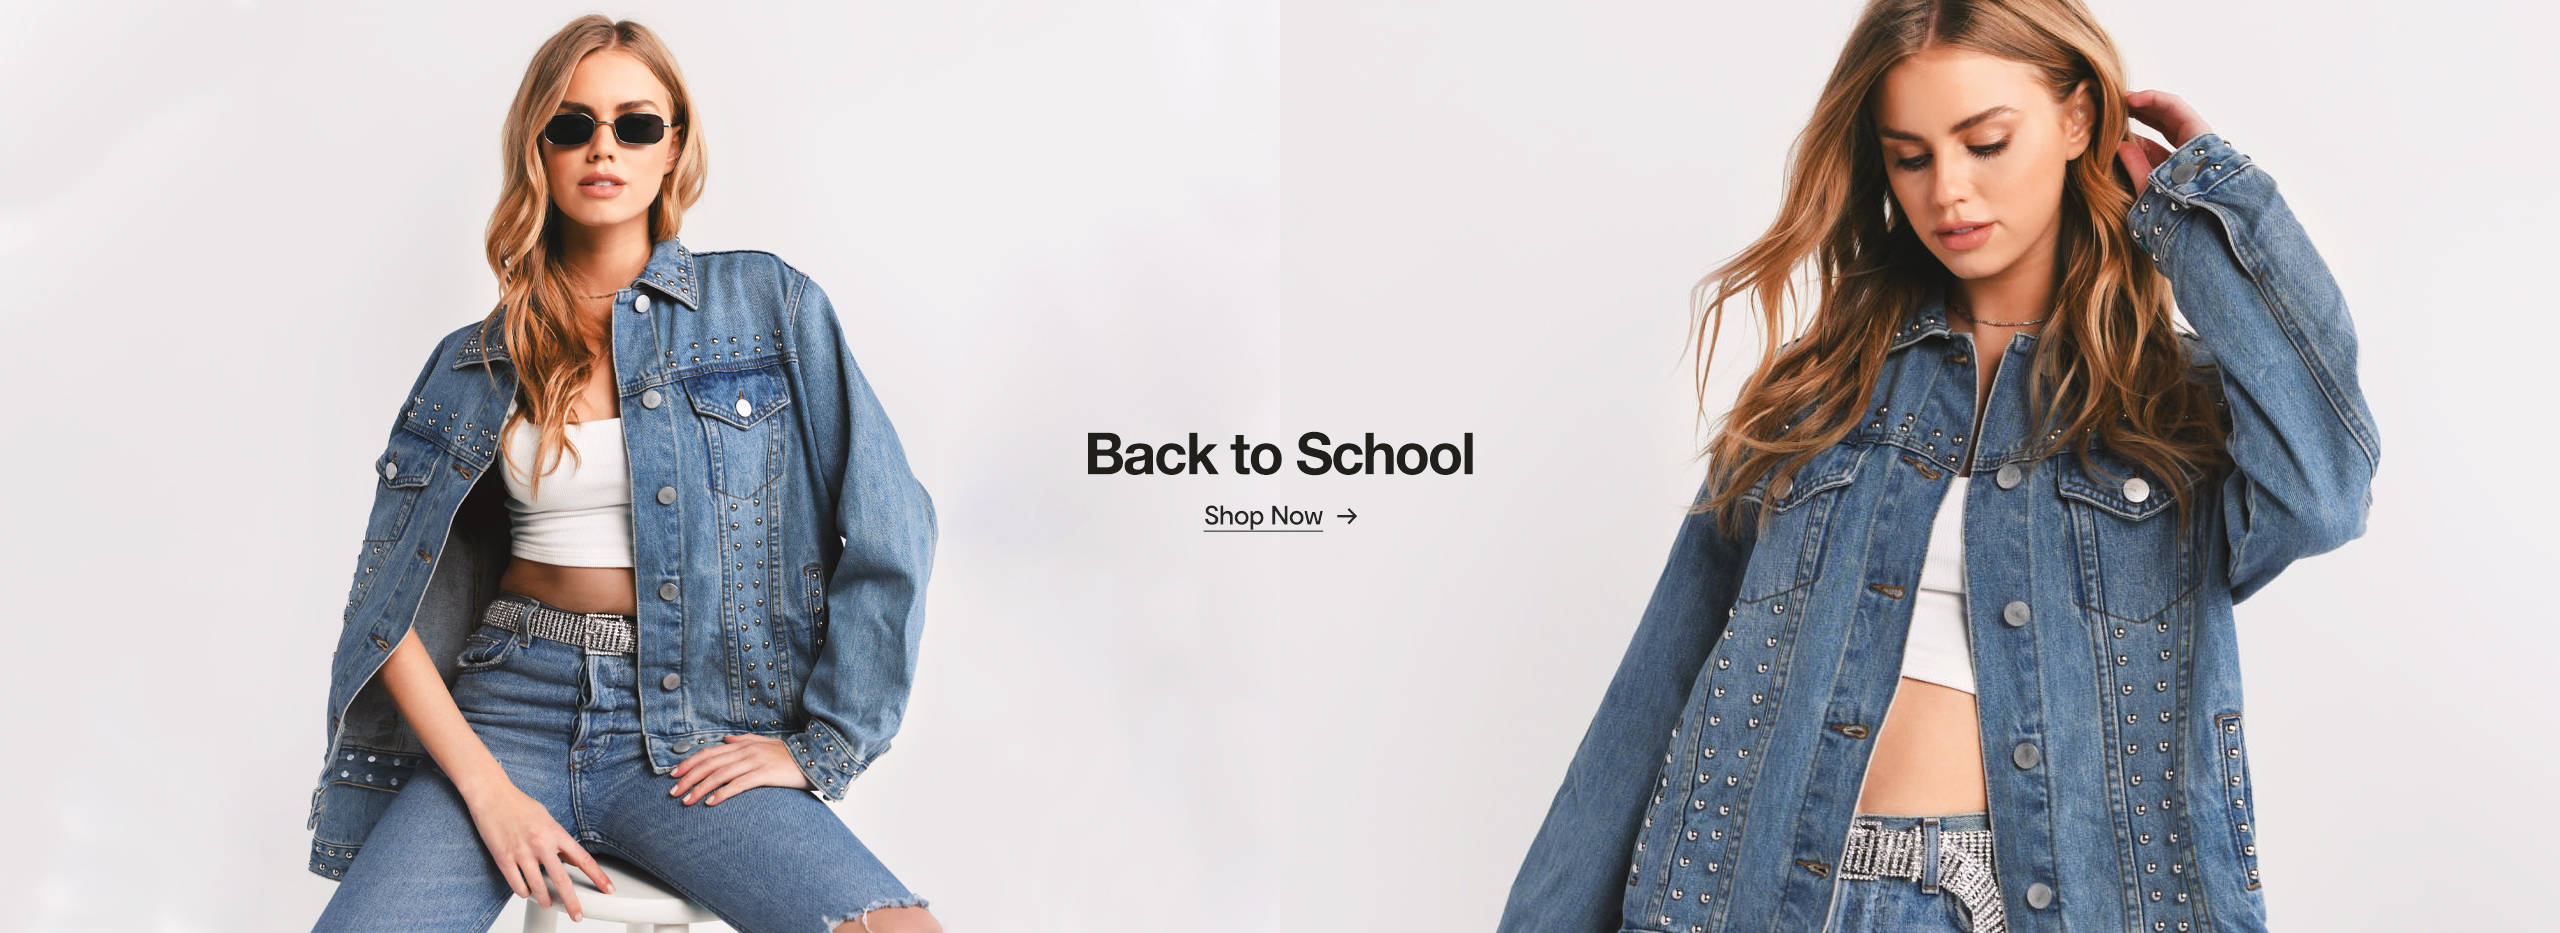 844a38a8 Tobi - Online Shopping Website for Women, Online Women's Clothing ...